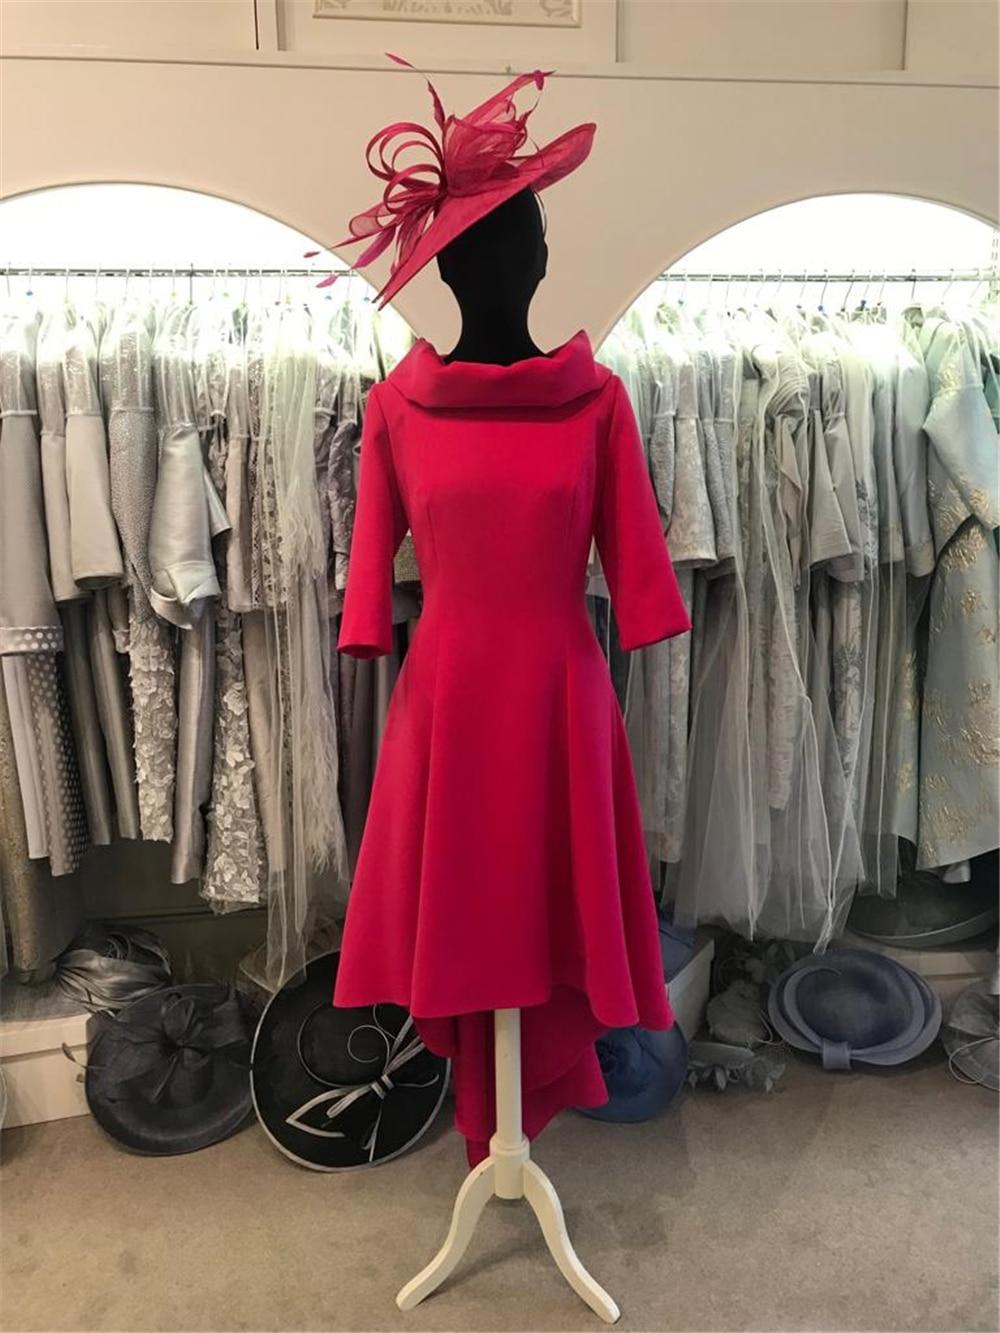 Excellent Chiffon Women's Dresses Half Sleeves Scoop High-Low Tea-Length Sheath Short Mother Of The Bride Dresses Plus Size